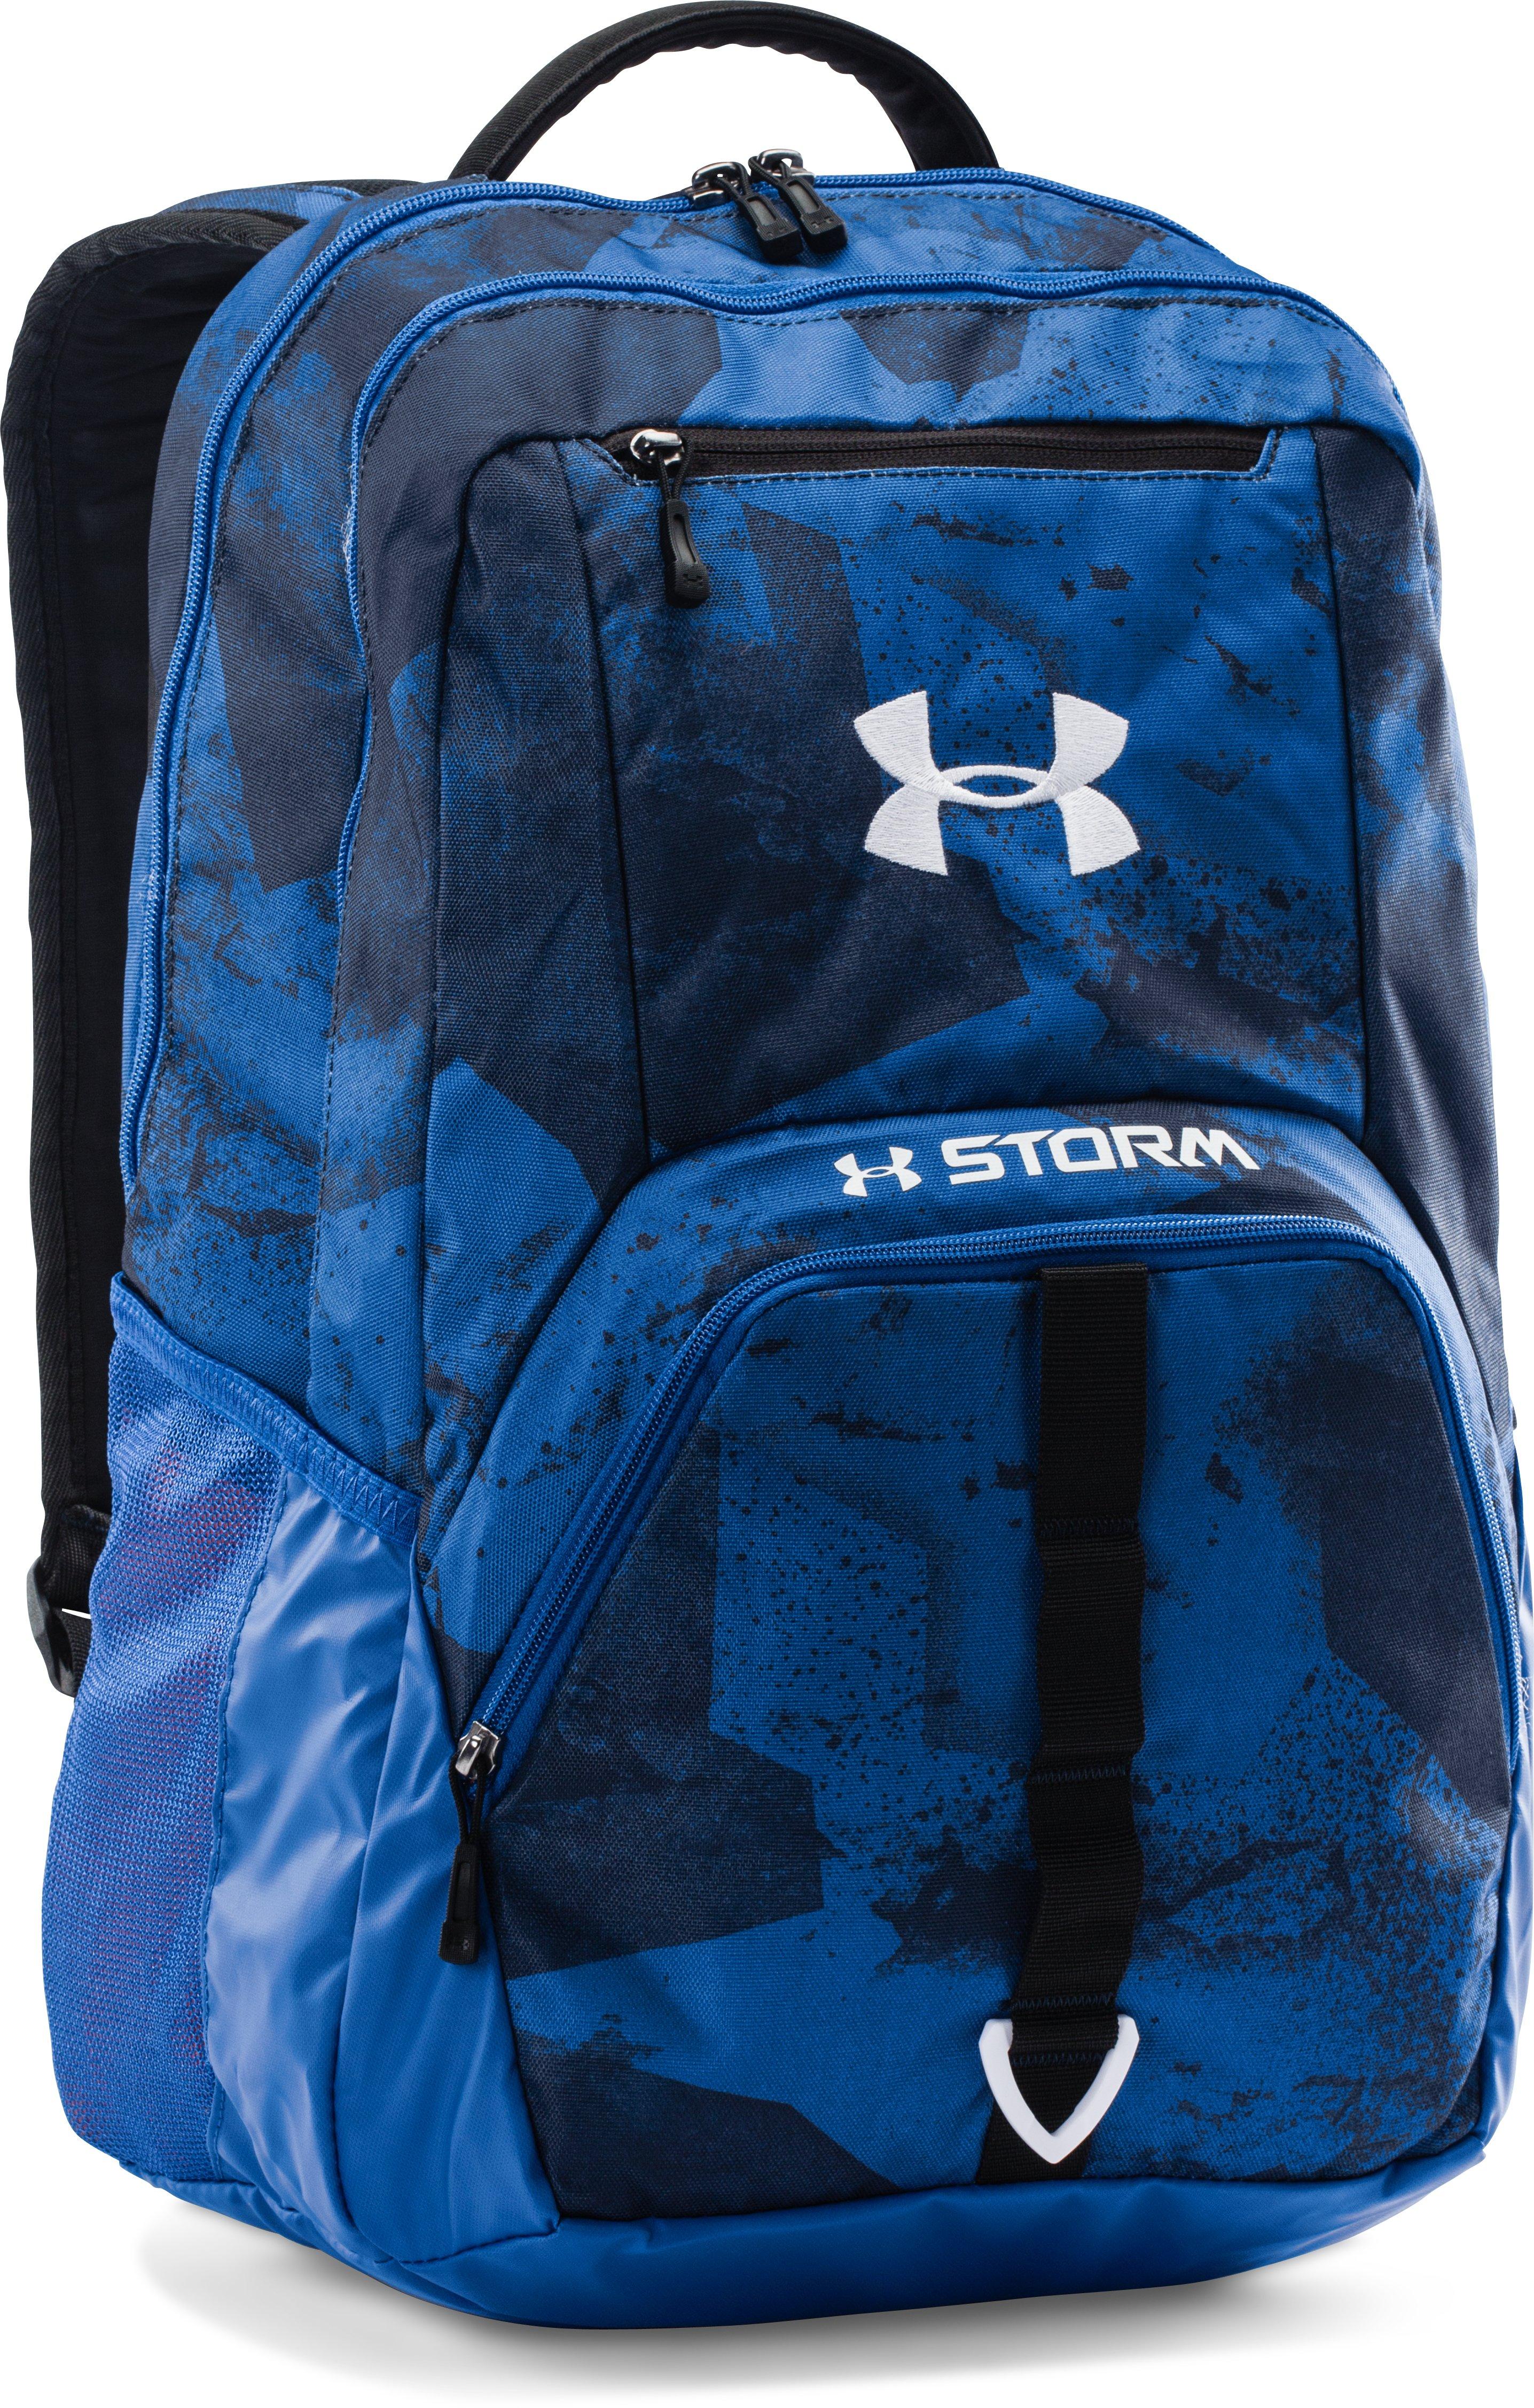 UA Camo Hustle Backpack | Under Armour FI